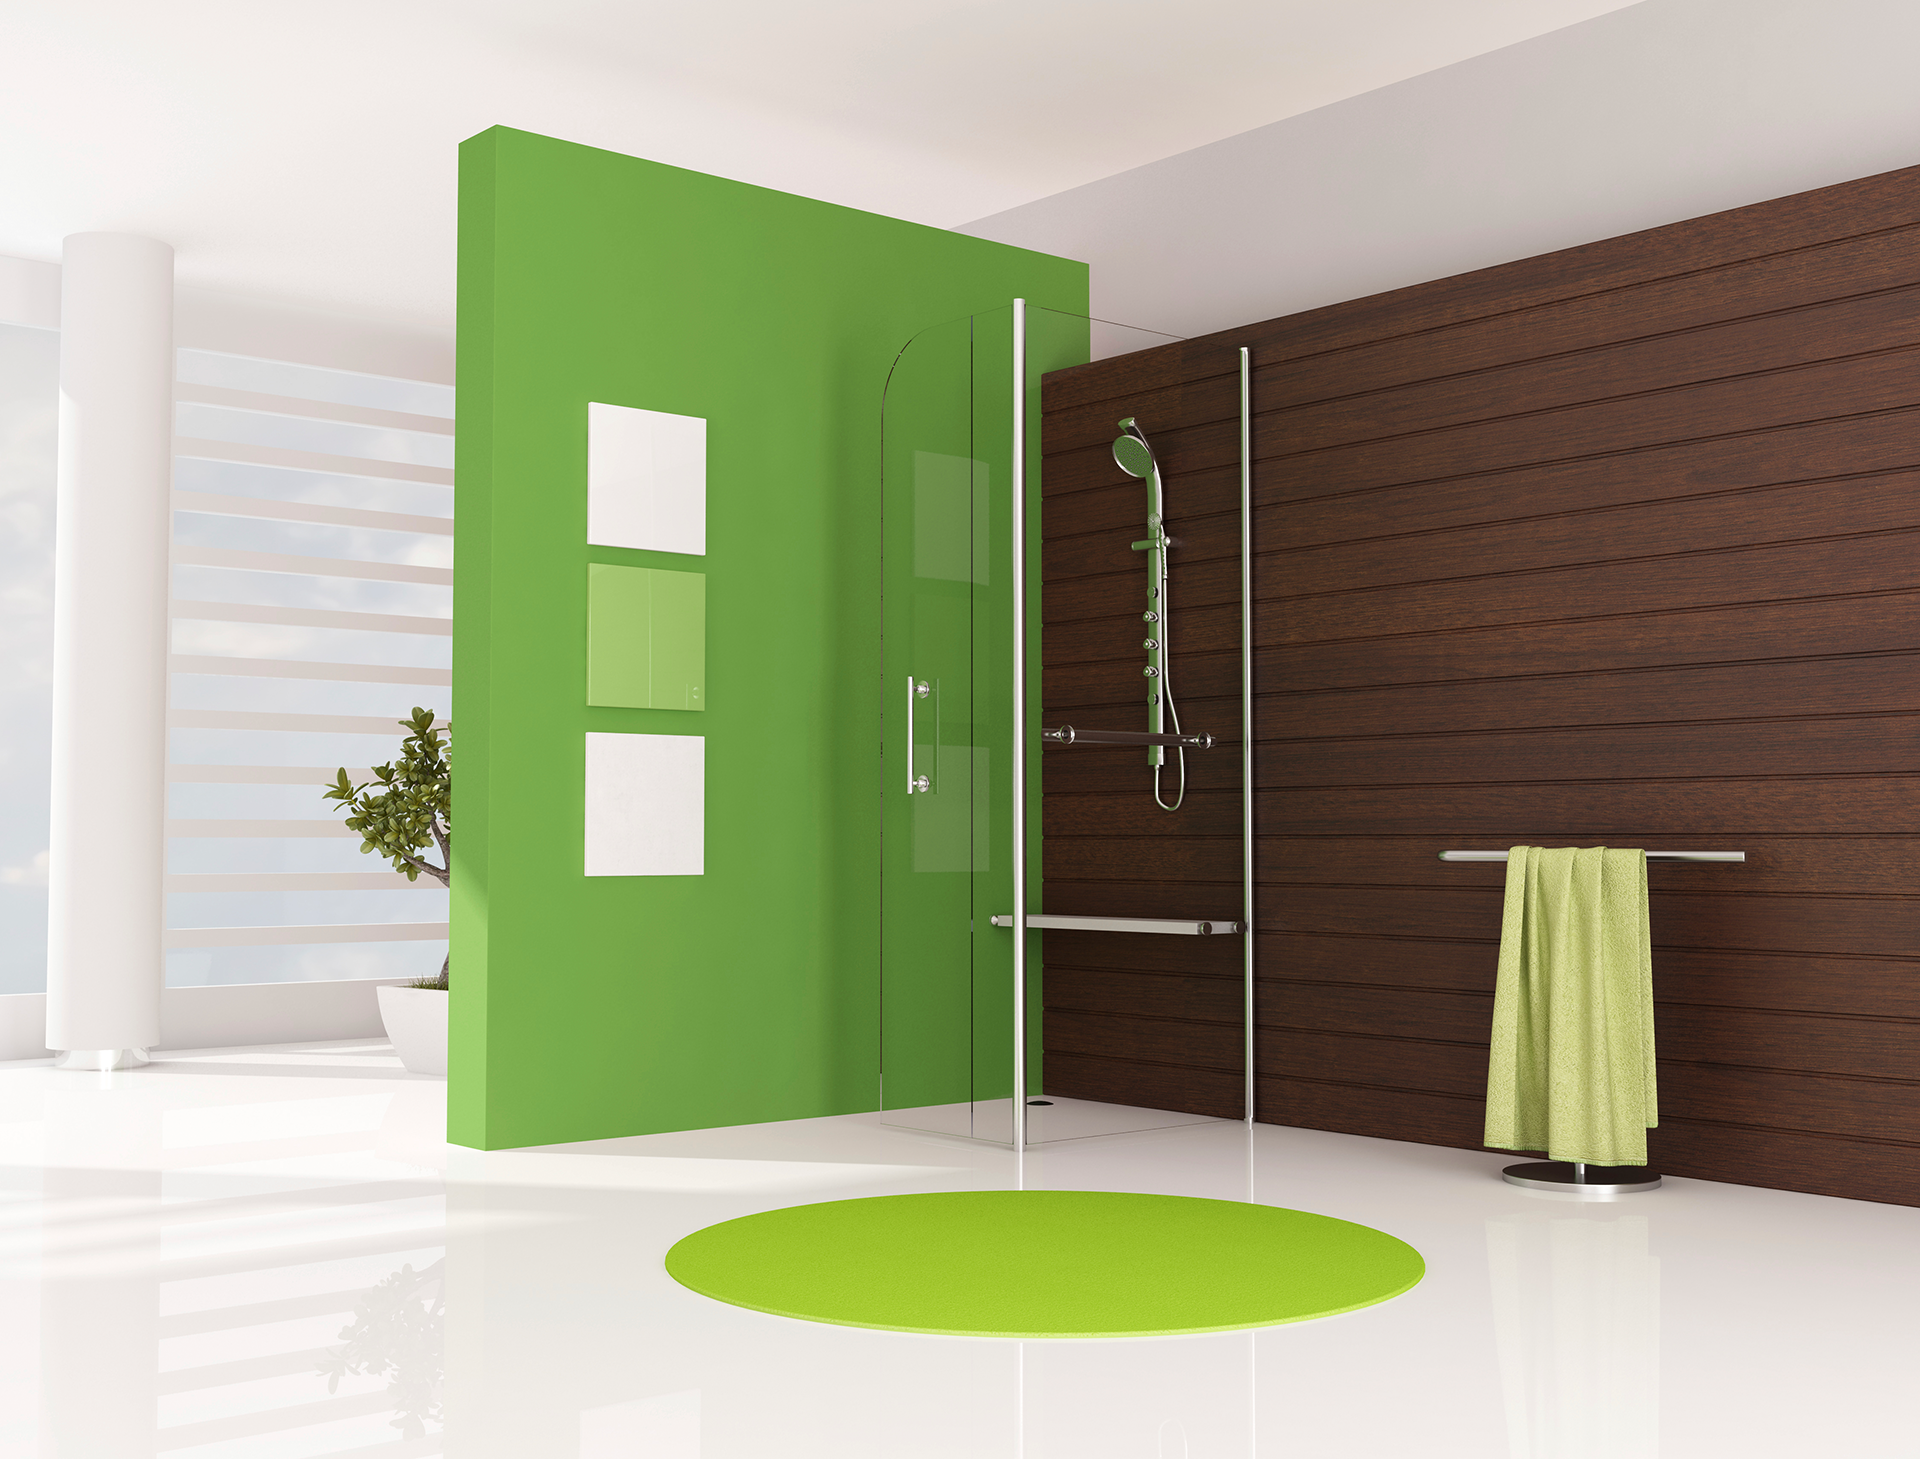 zypho w rmer ckgewinnung in der dusche rabmer gruppe. Black Bedroom Furniture Sets. Home Design Ideas